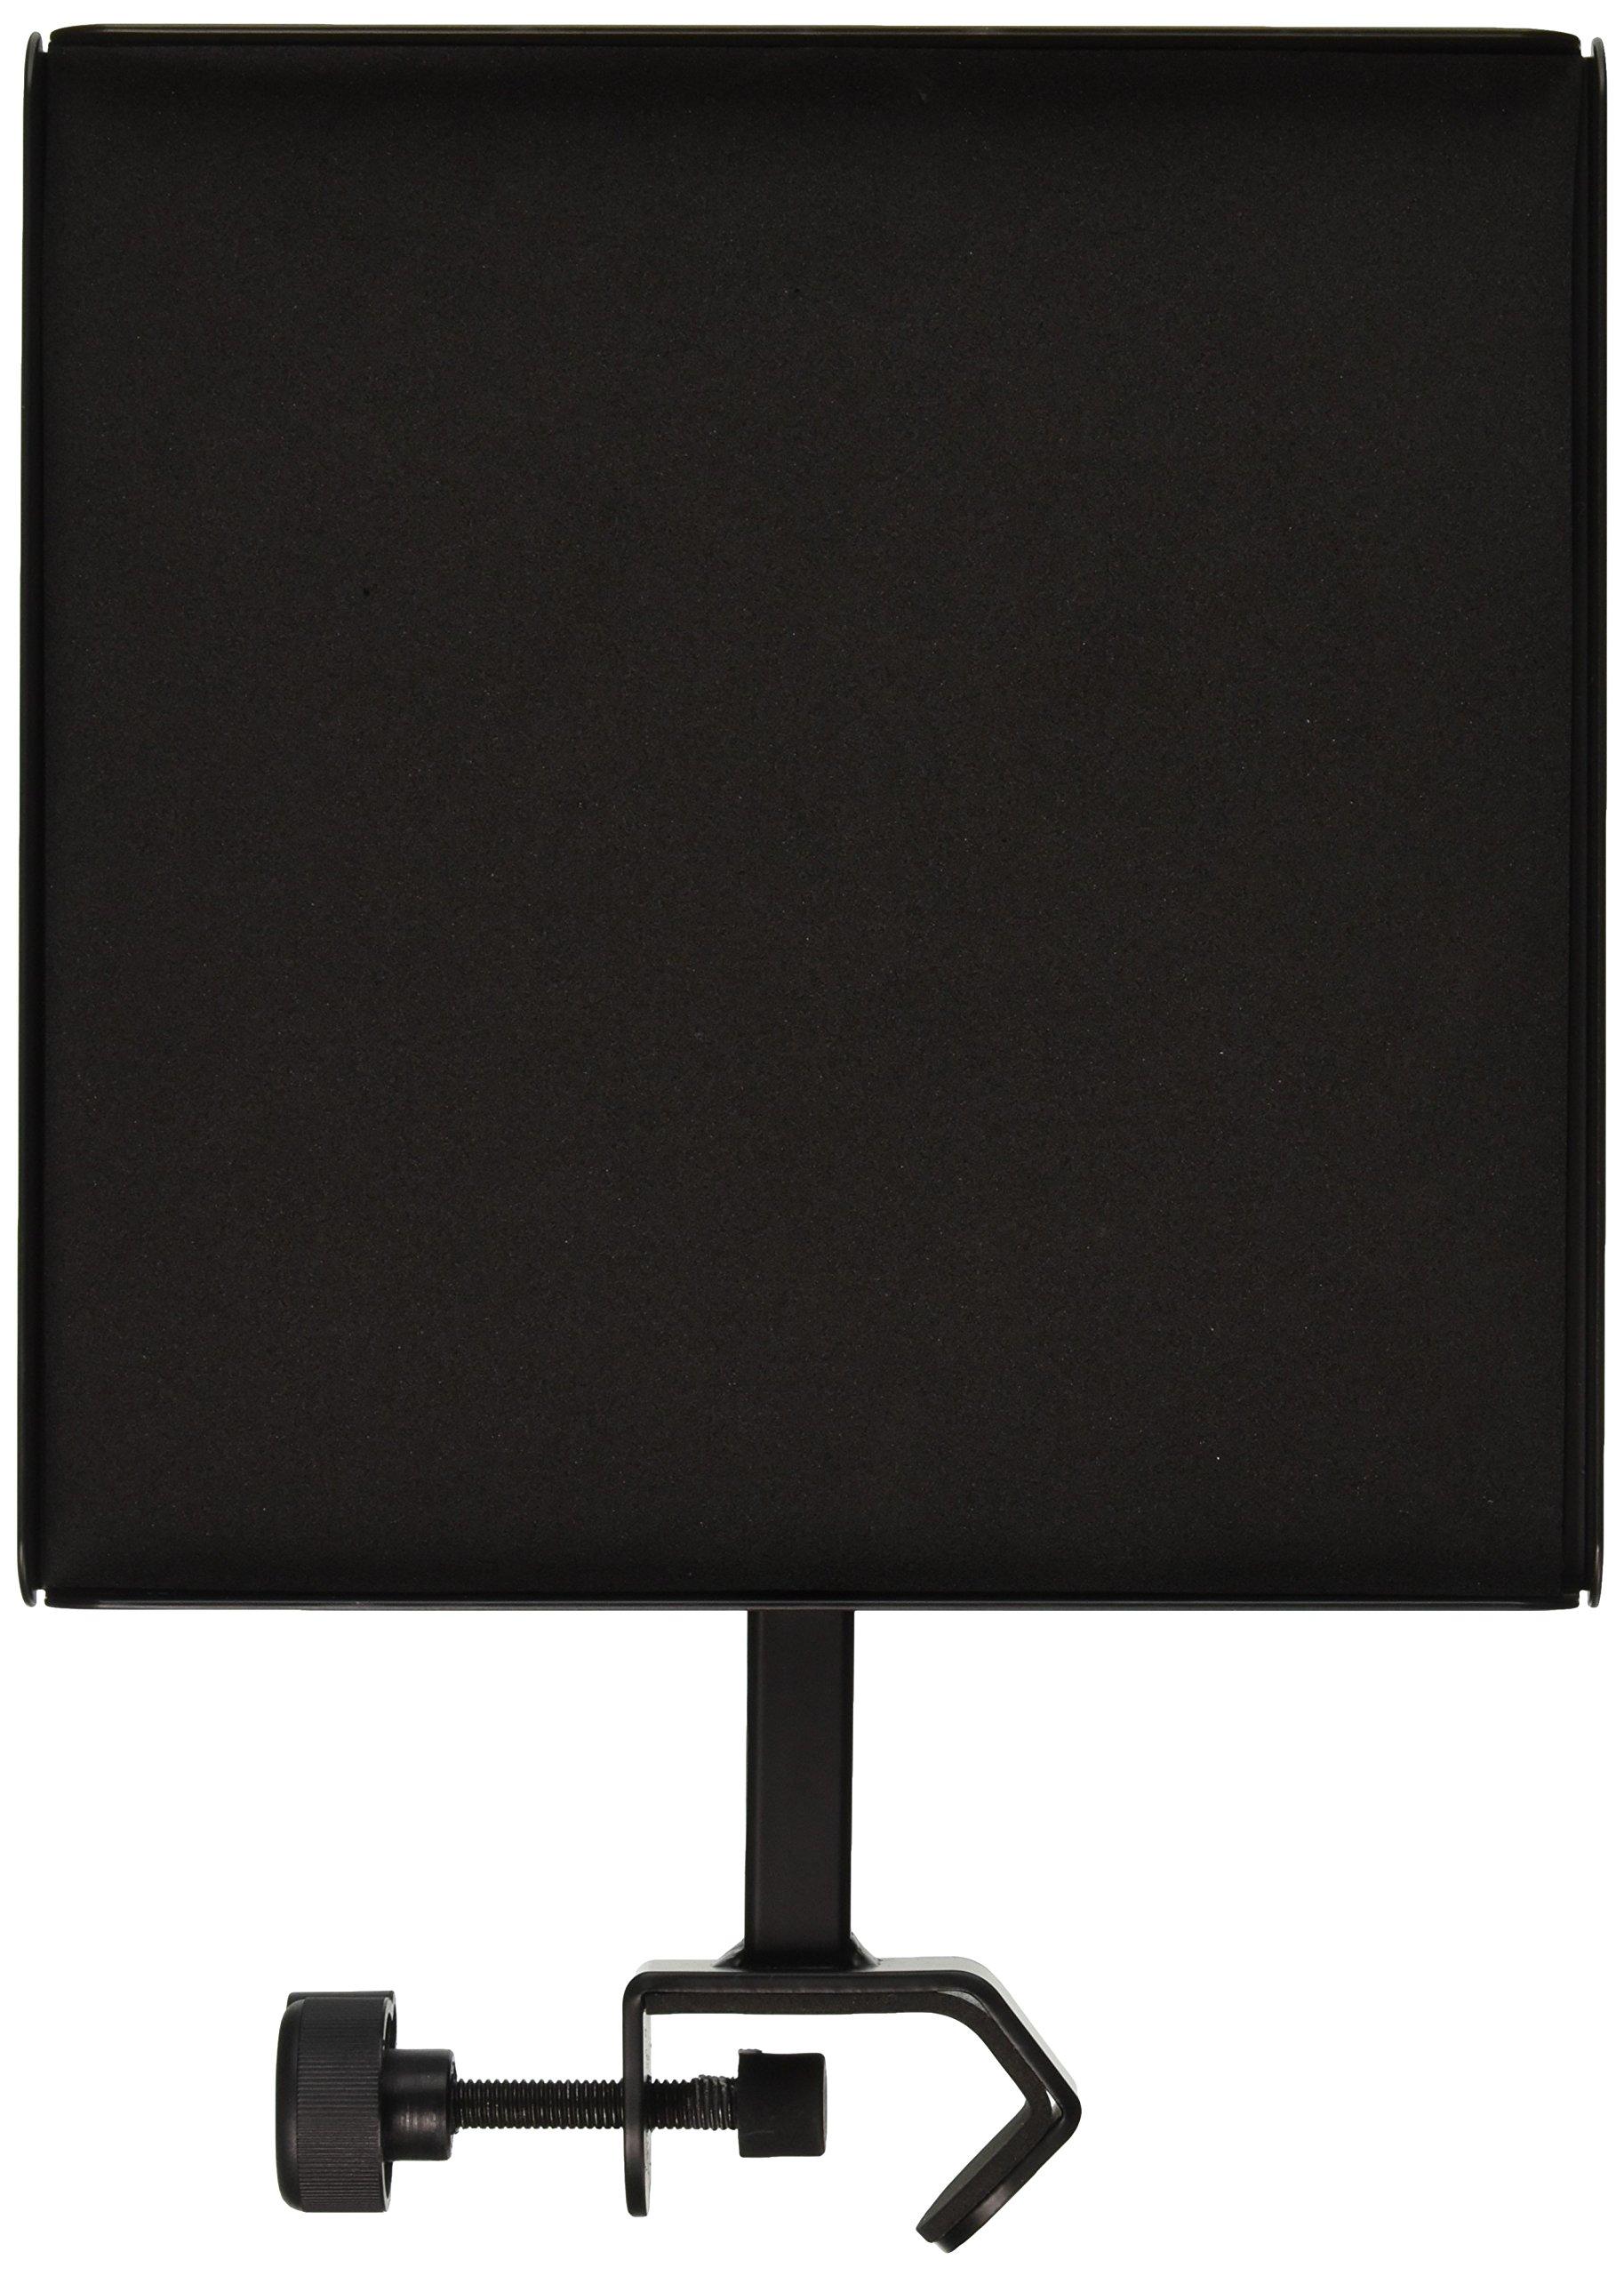 Quiklok Microphone Stand (MS/329)